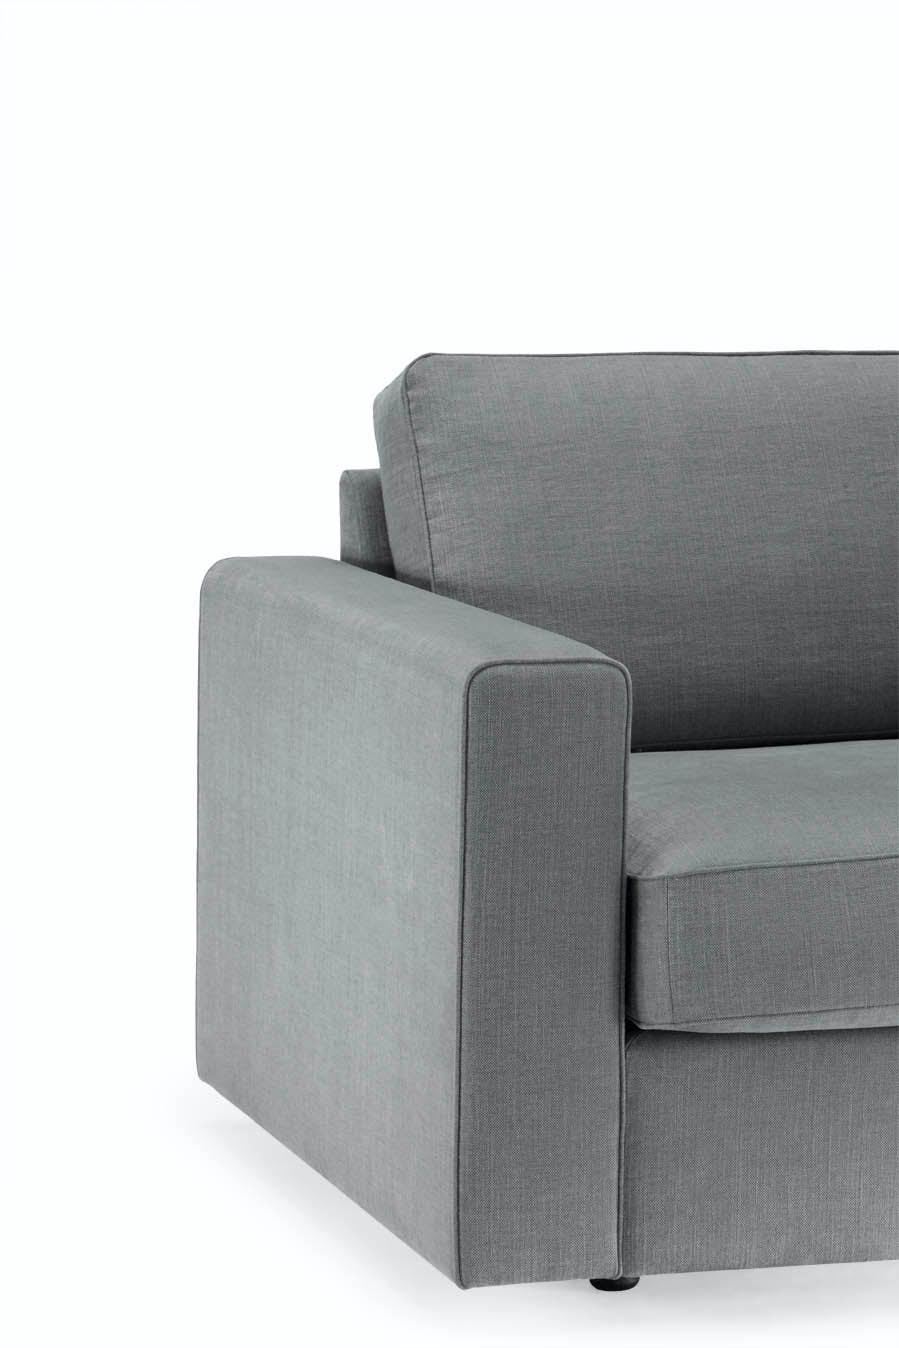 Jab Anstoetz Low Back Jon Edwards Modular Sofa Haute Living